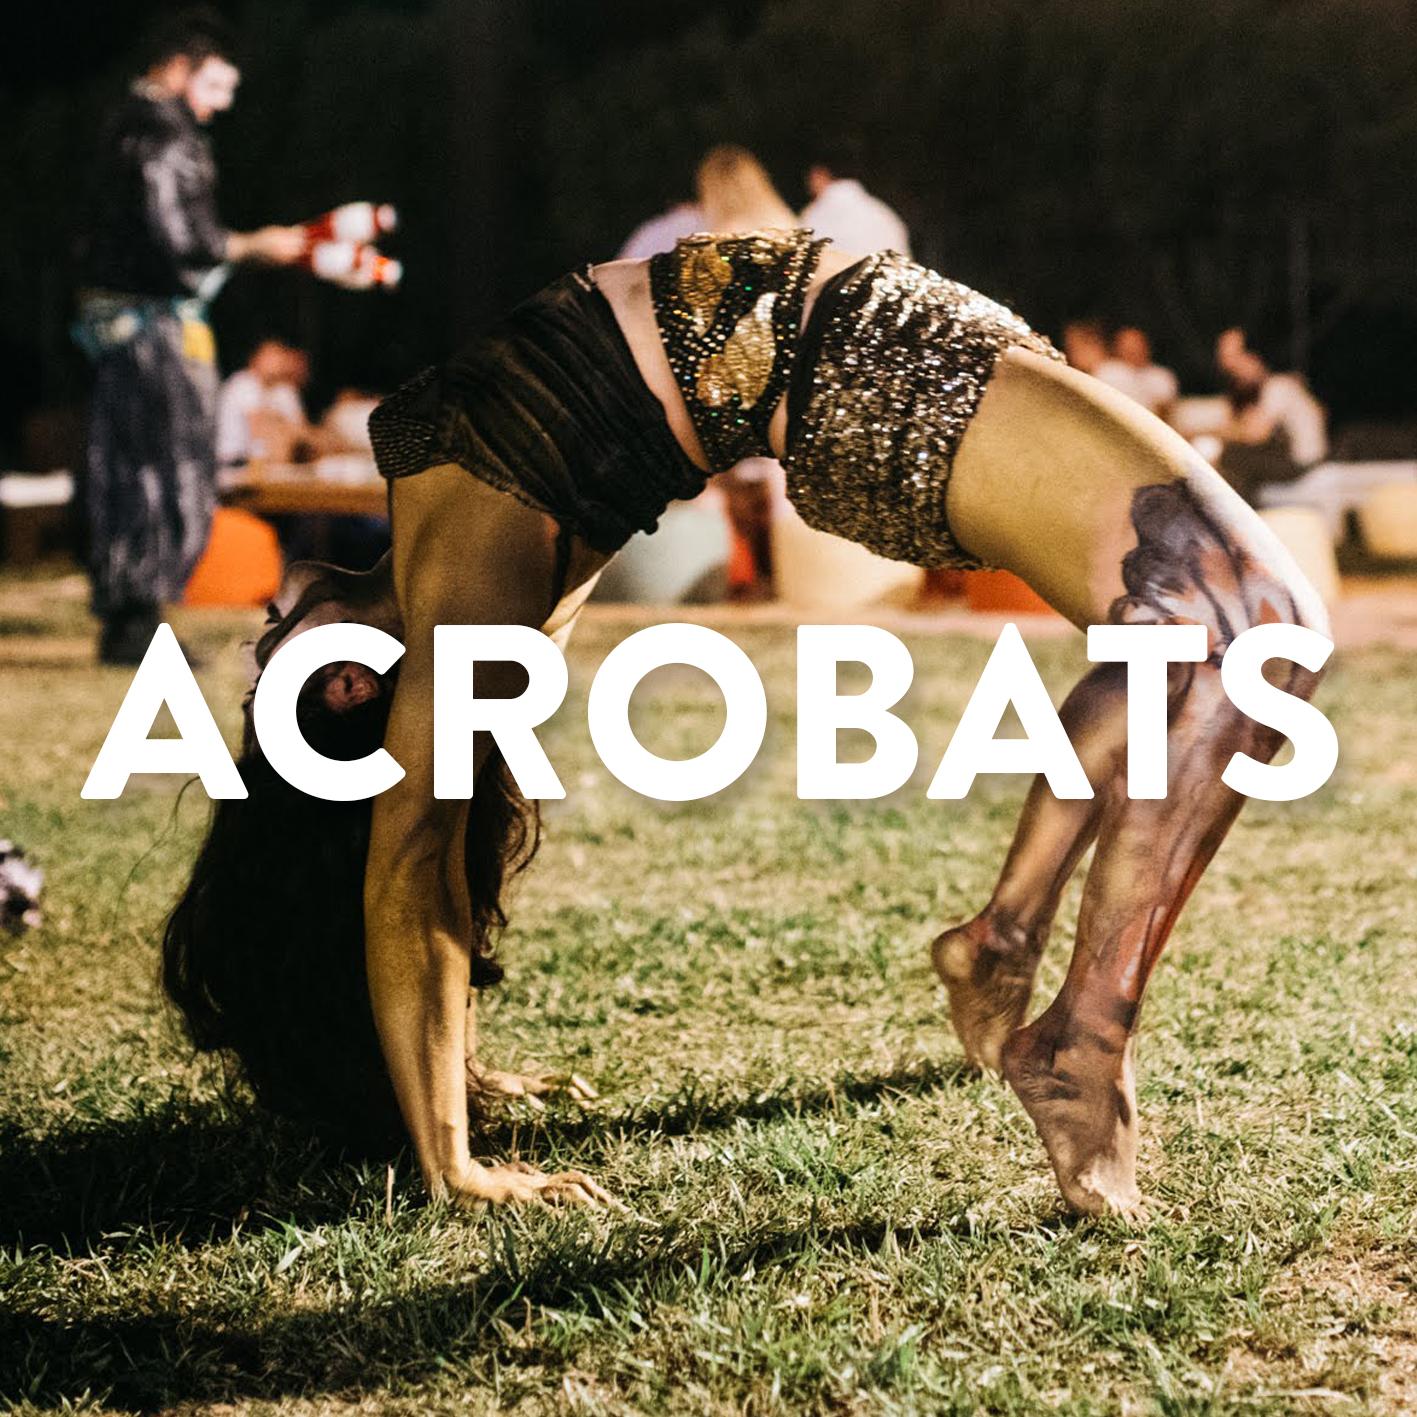 actrobats.jpg